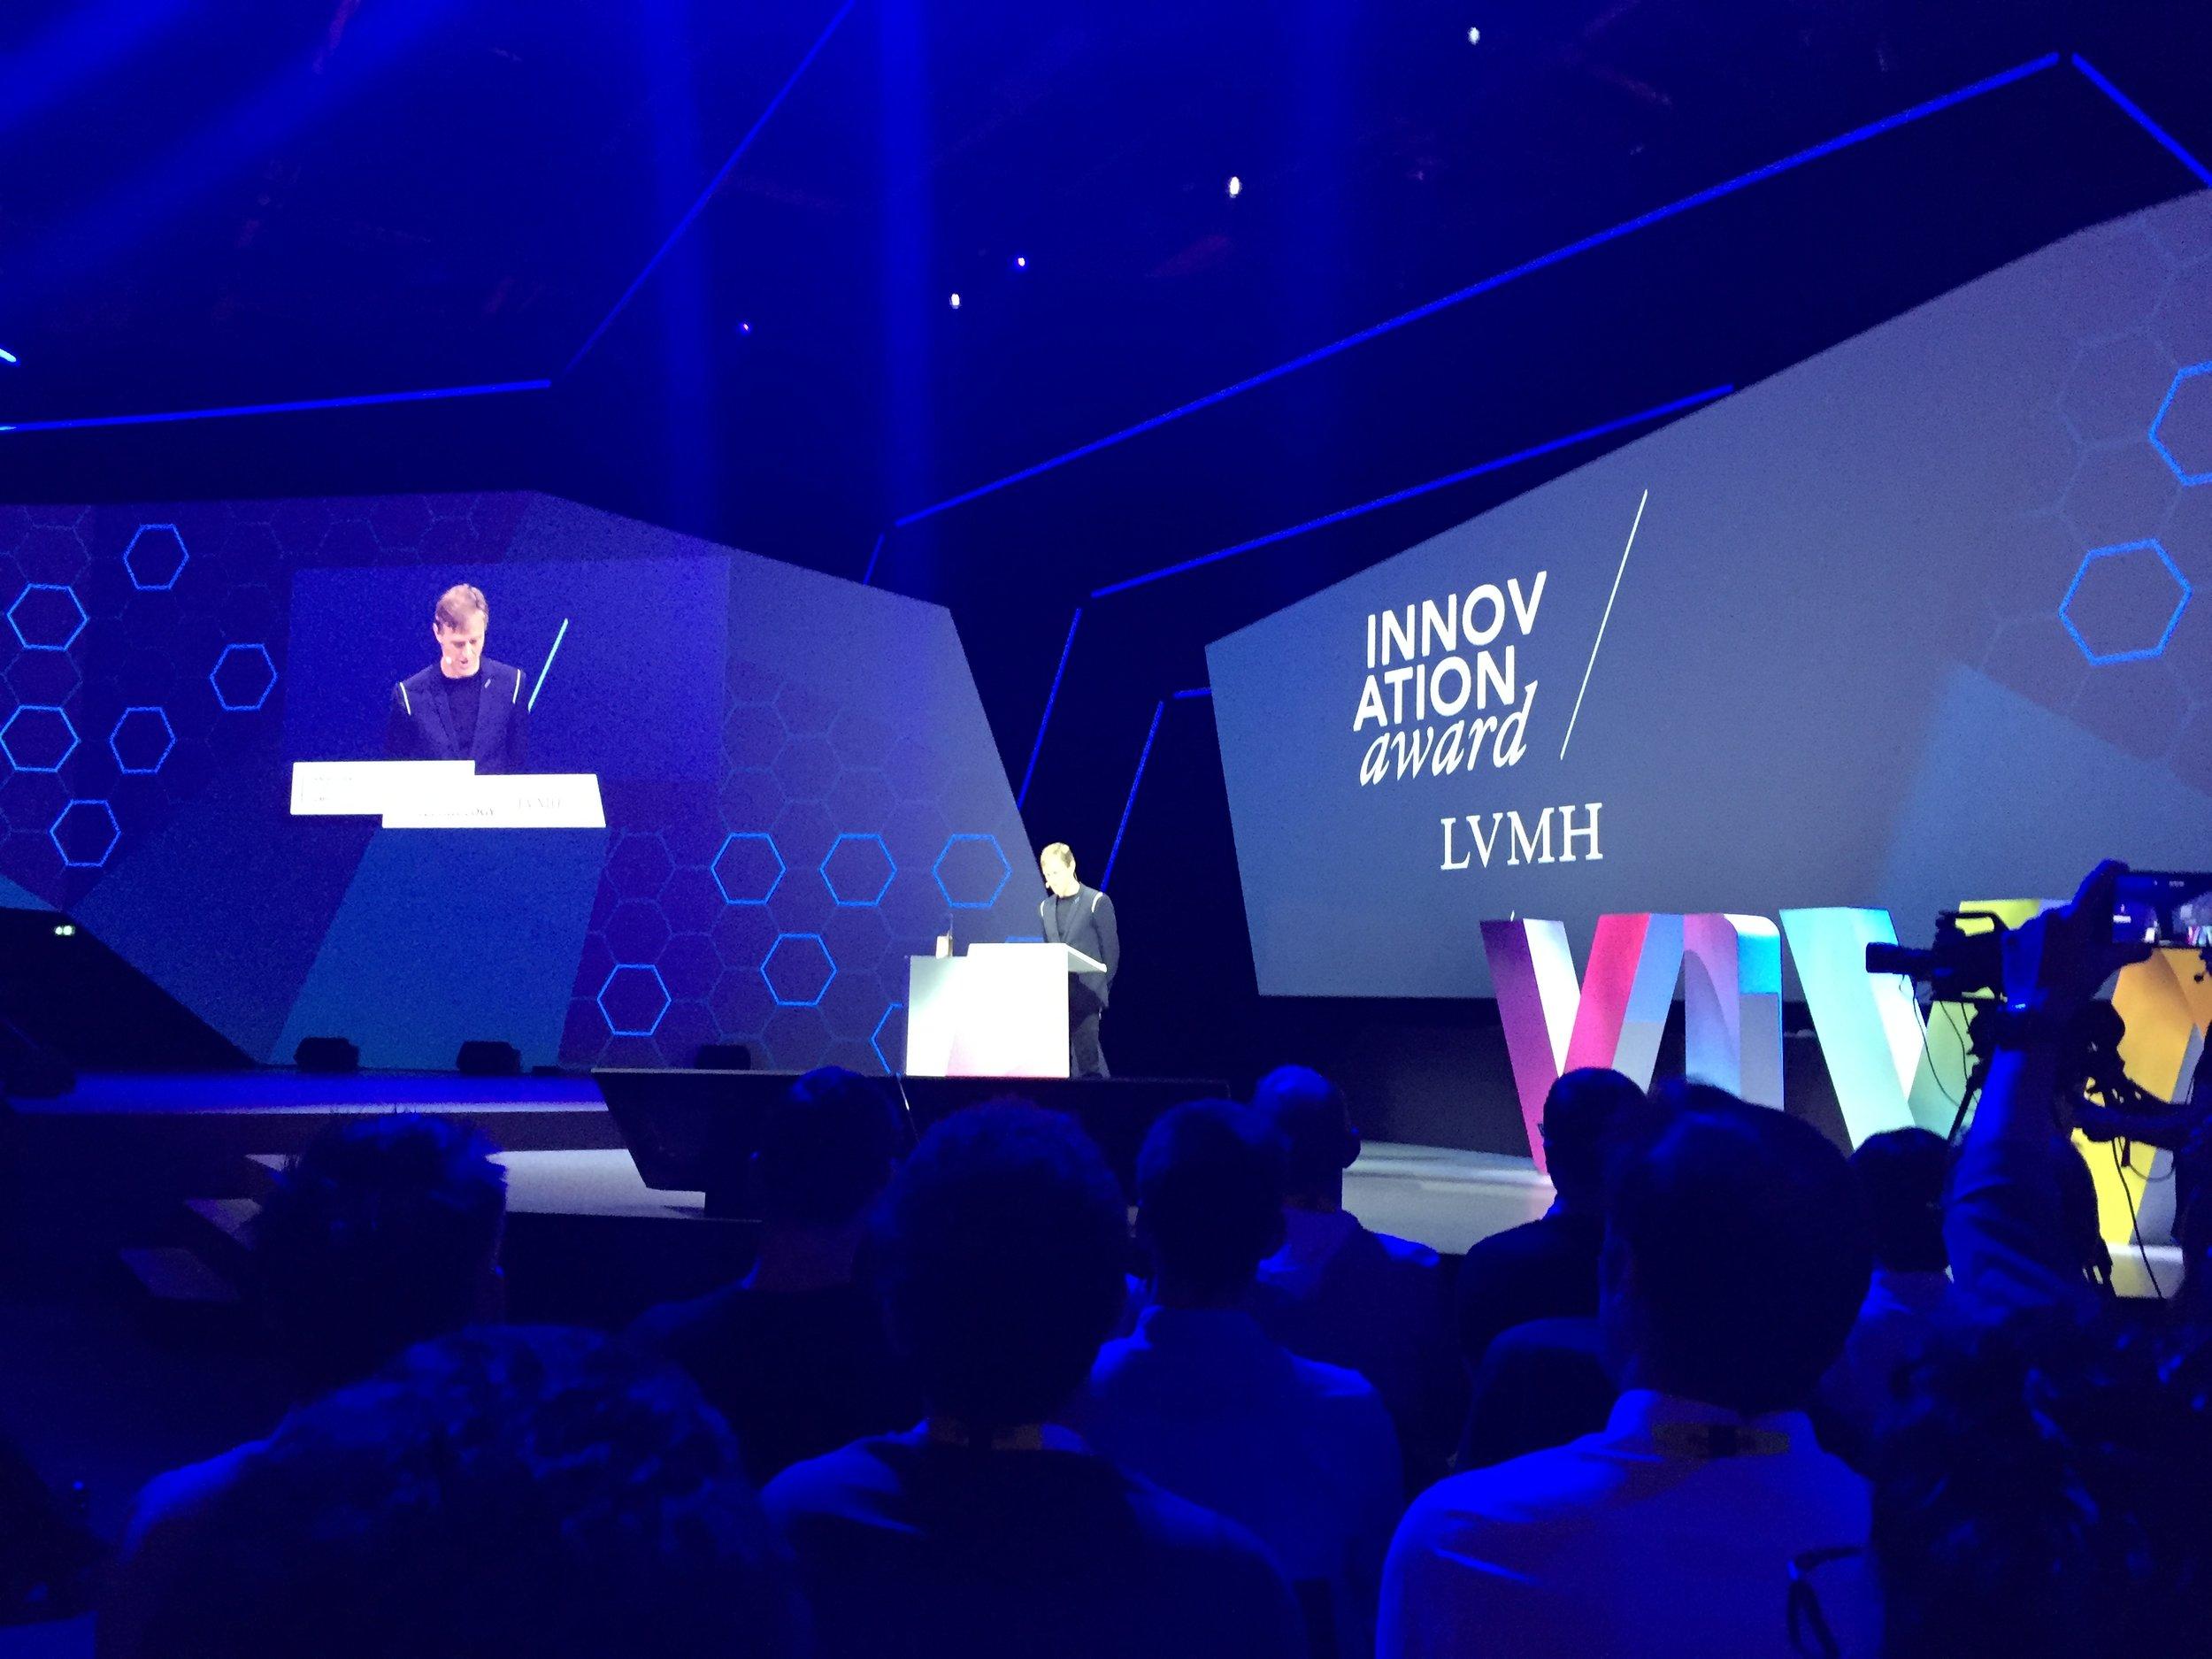 LVMH Group CDO Ian Rogers on stage to announce winners of the 2018 LVMH Innovation Award